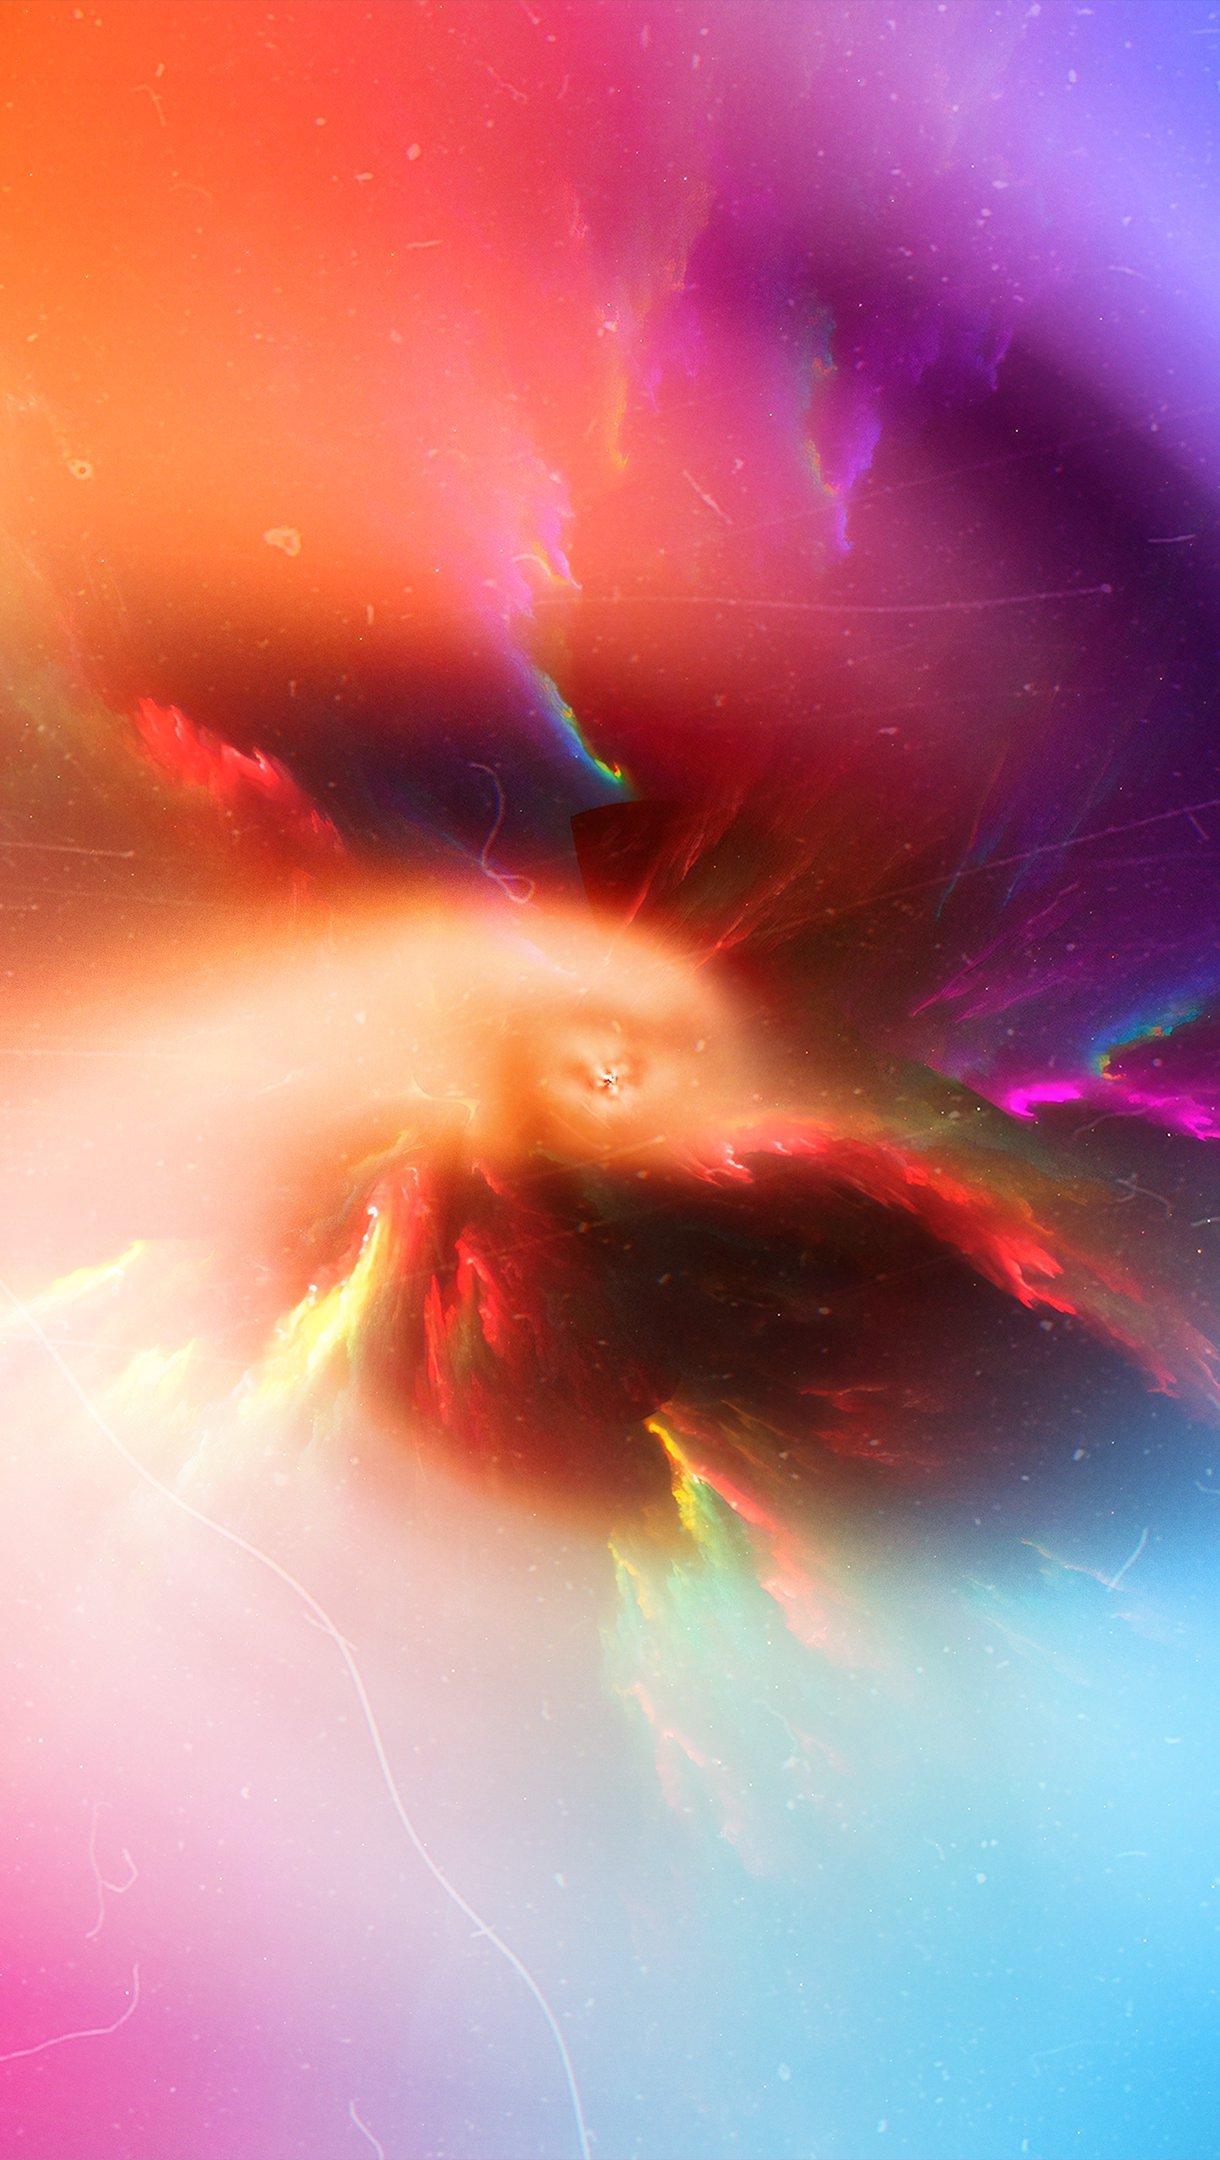 Abstract motion Wallpaper 4k Ultra HD ...